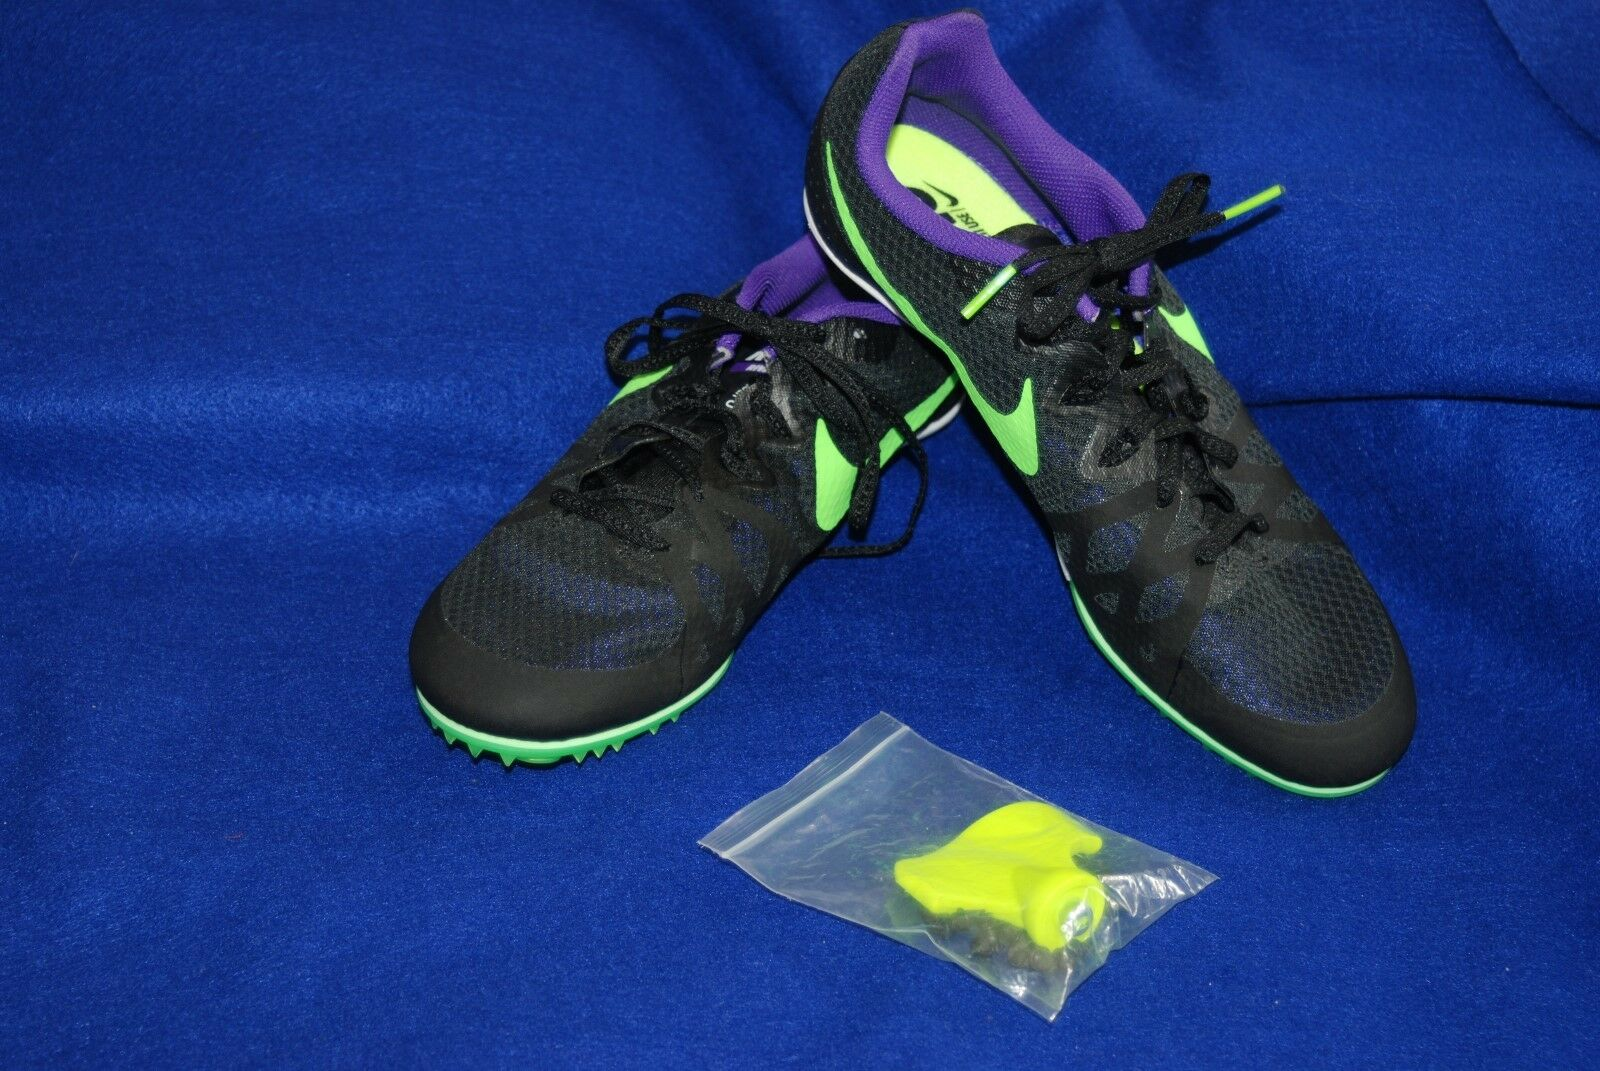 Nike Zoom Rival M 8 Men's Track Spikes 806555-035  Black Green Purple Comfortable